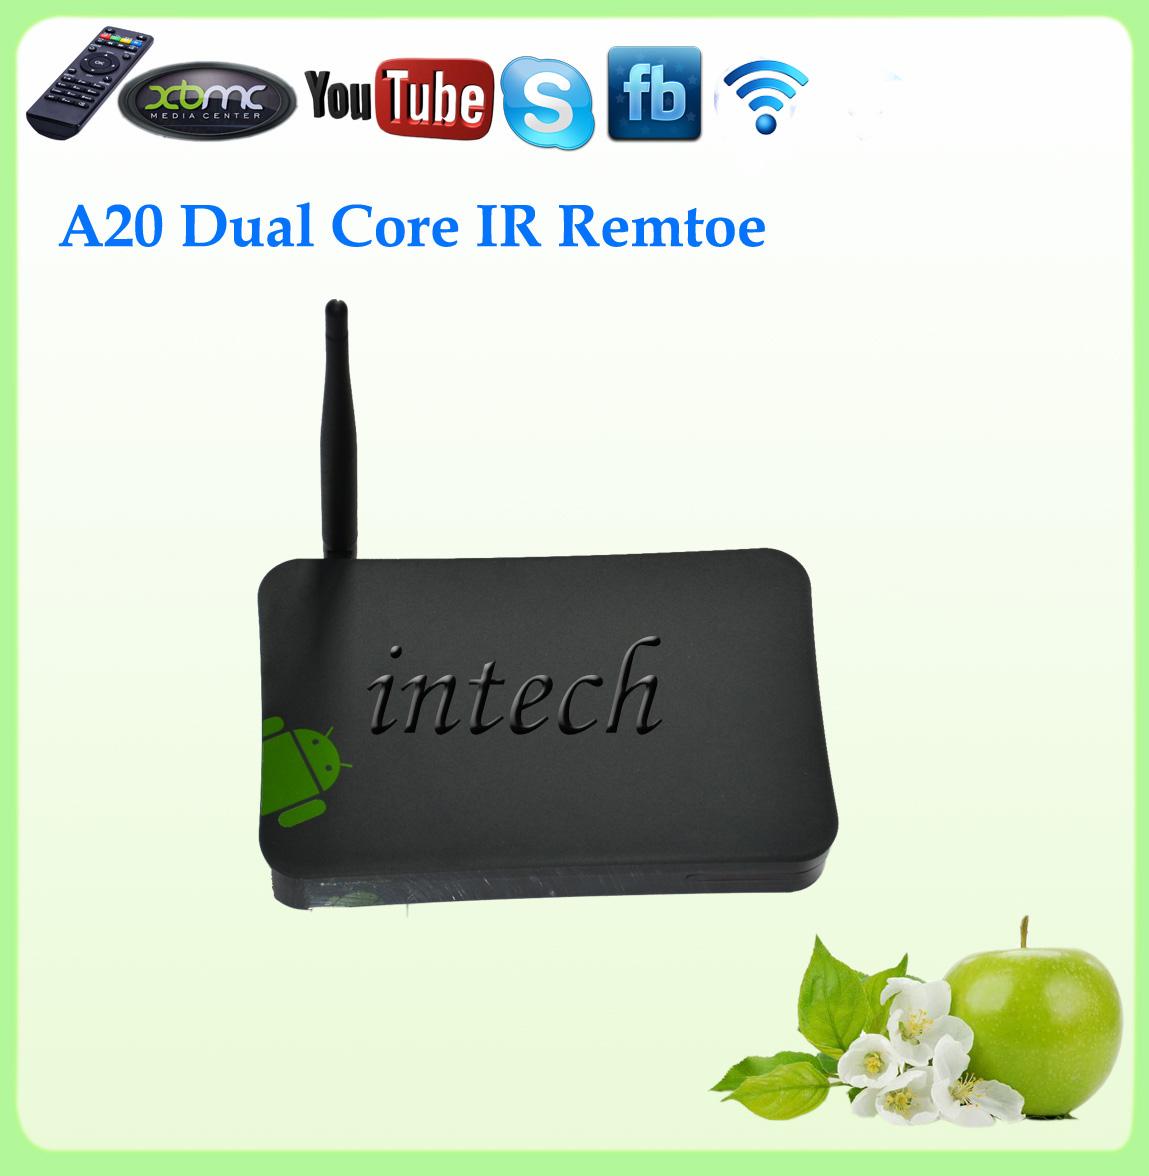 Cheapest Dual Core Allwinner A20 RJ45 XBMC Dongle Free TV A20 Dual ARM Cortex 1G+4G Android Internet Media Player HDMI(China (Mainland))